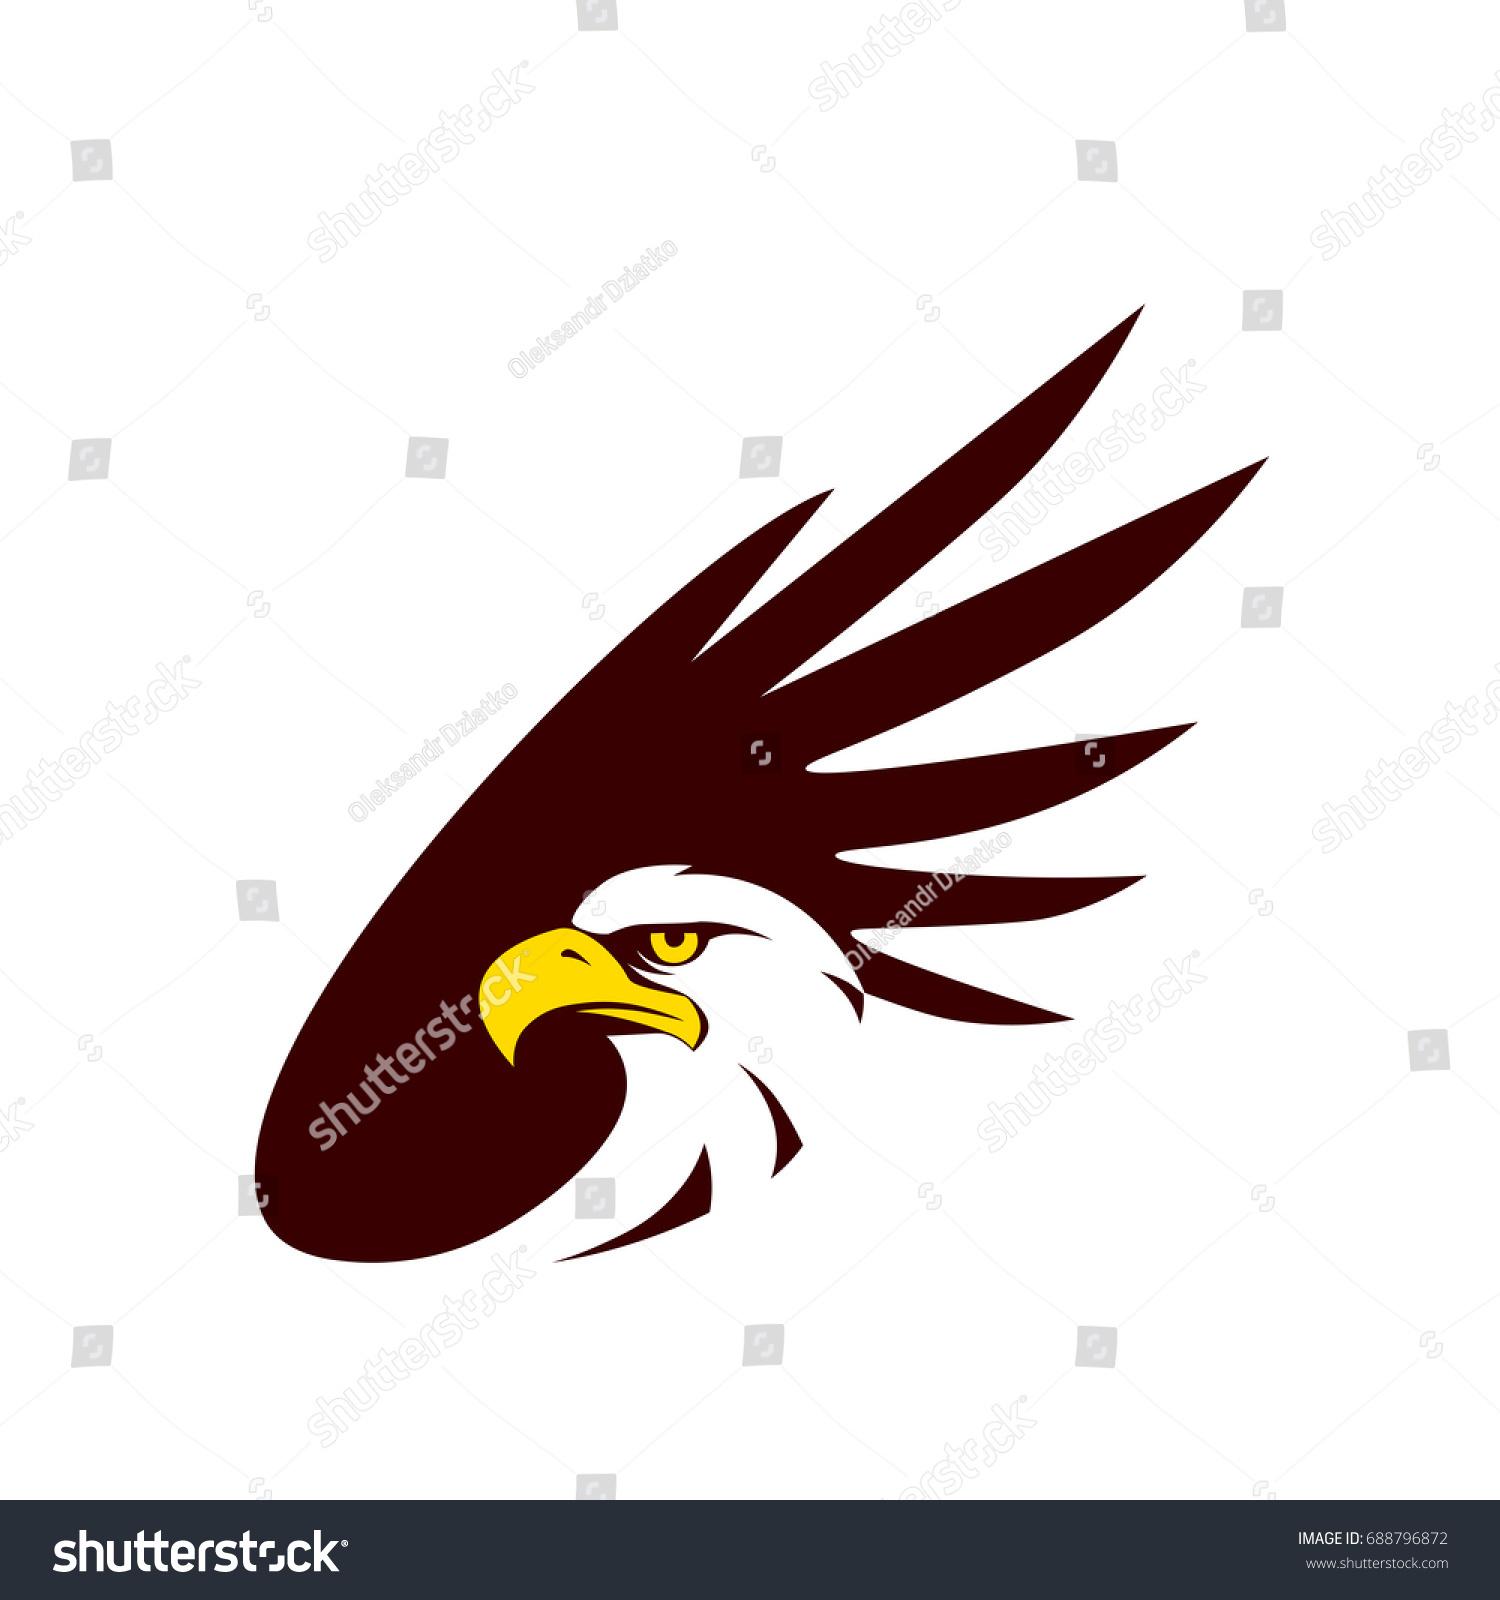 Symbol eagle hawk predator sport team stock vector 688796872 symbol of eagle hawk predator for sport team mascot company badge guard service biocorpaavc Images